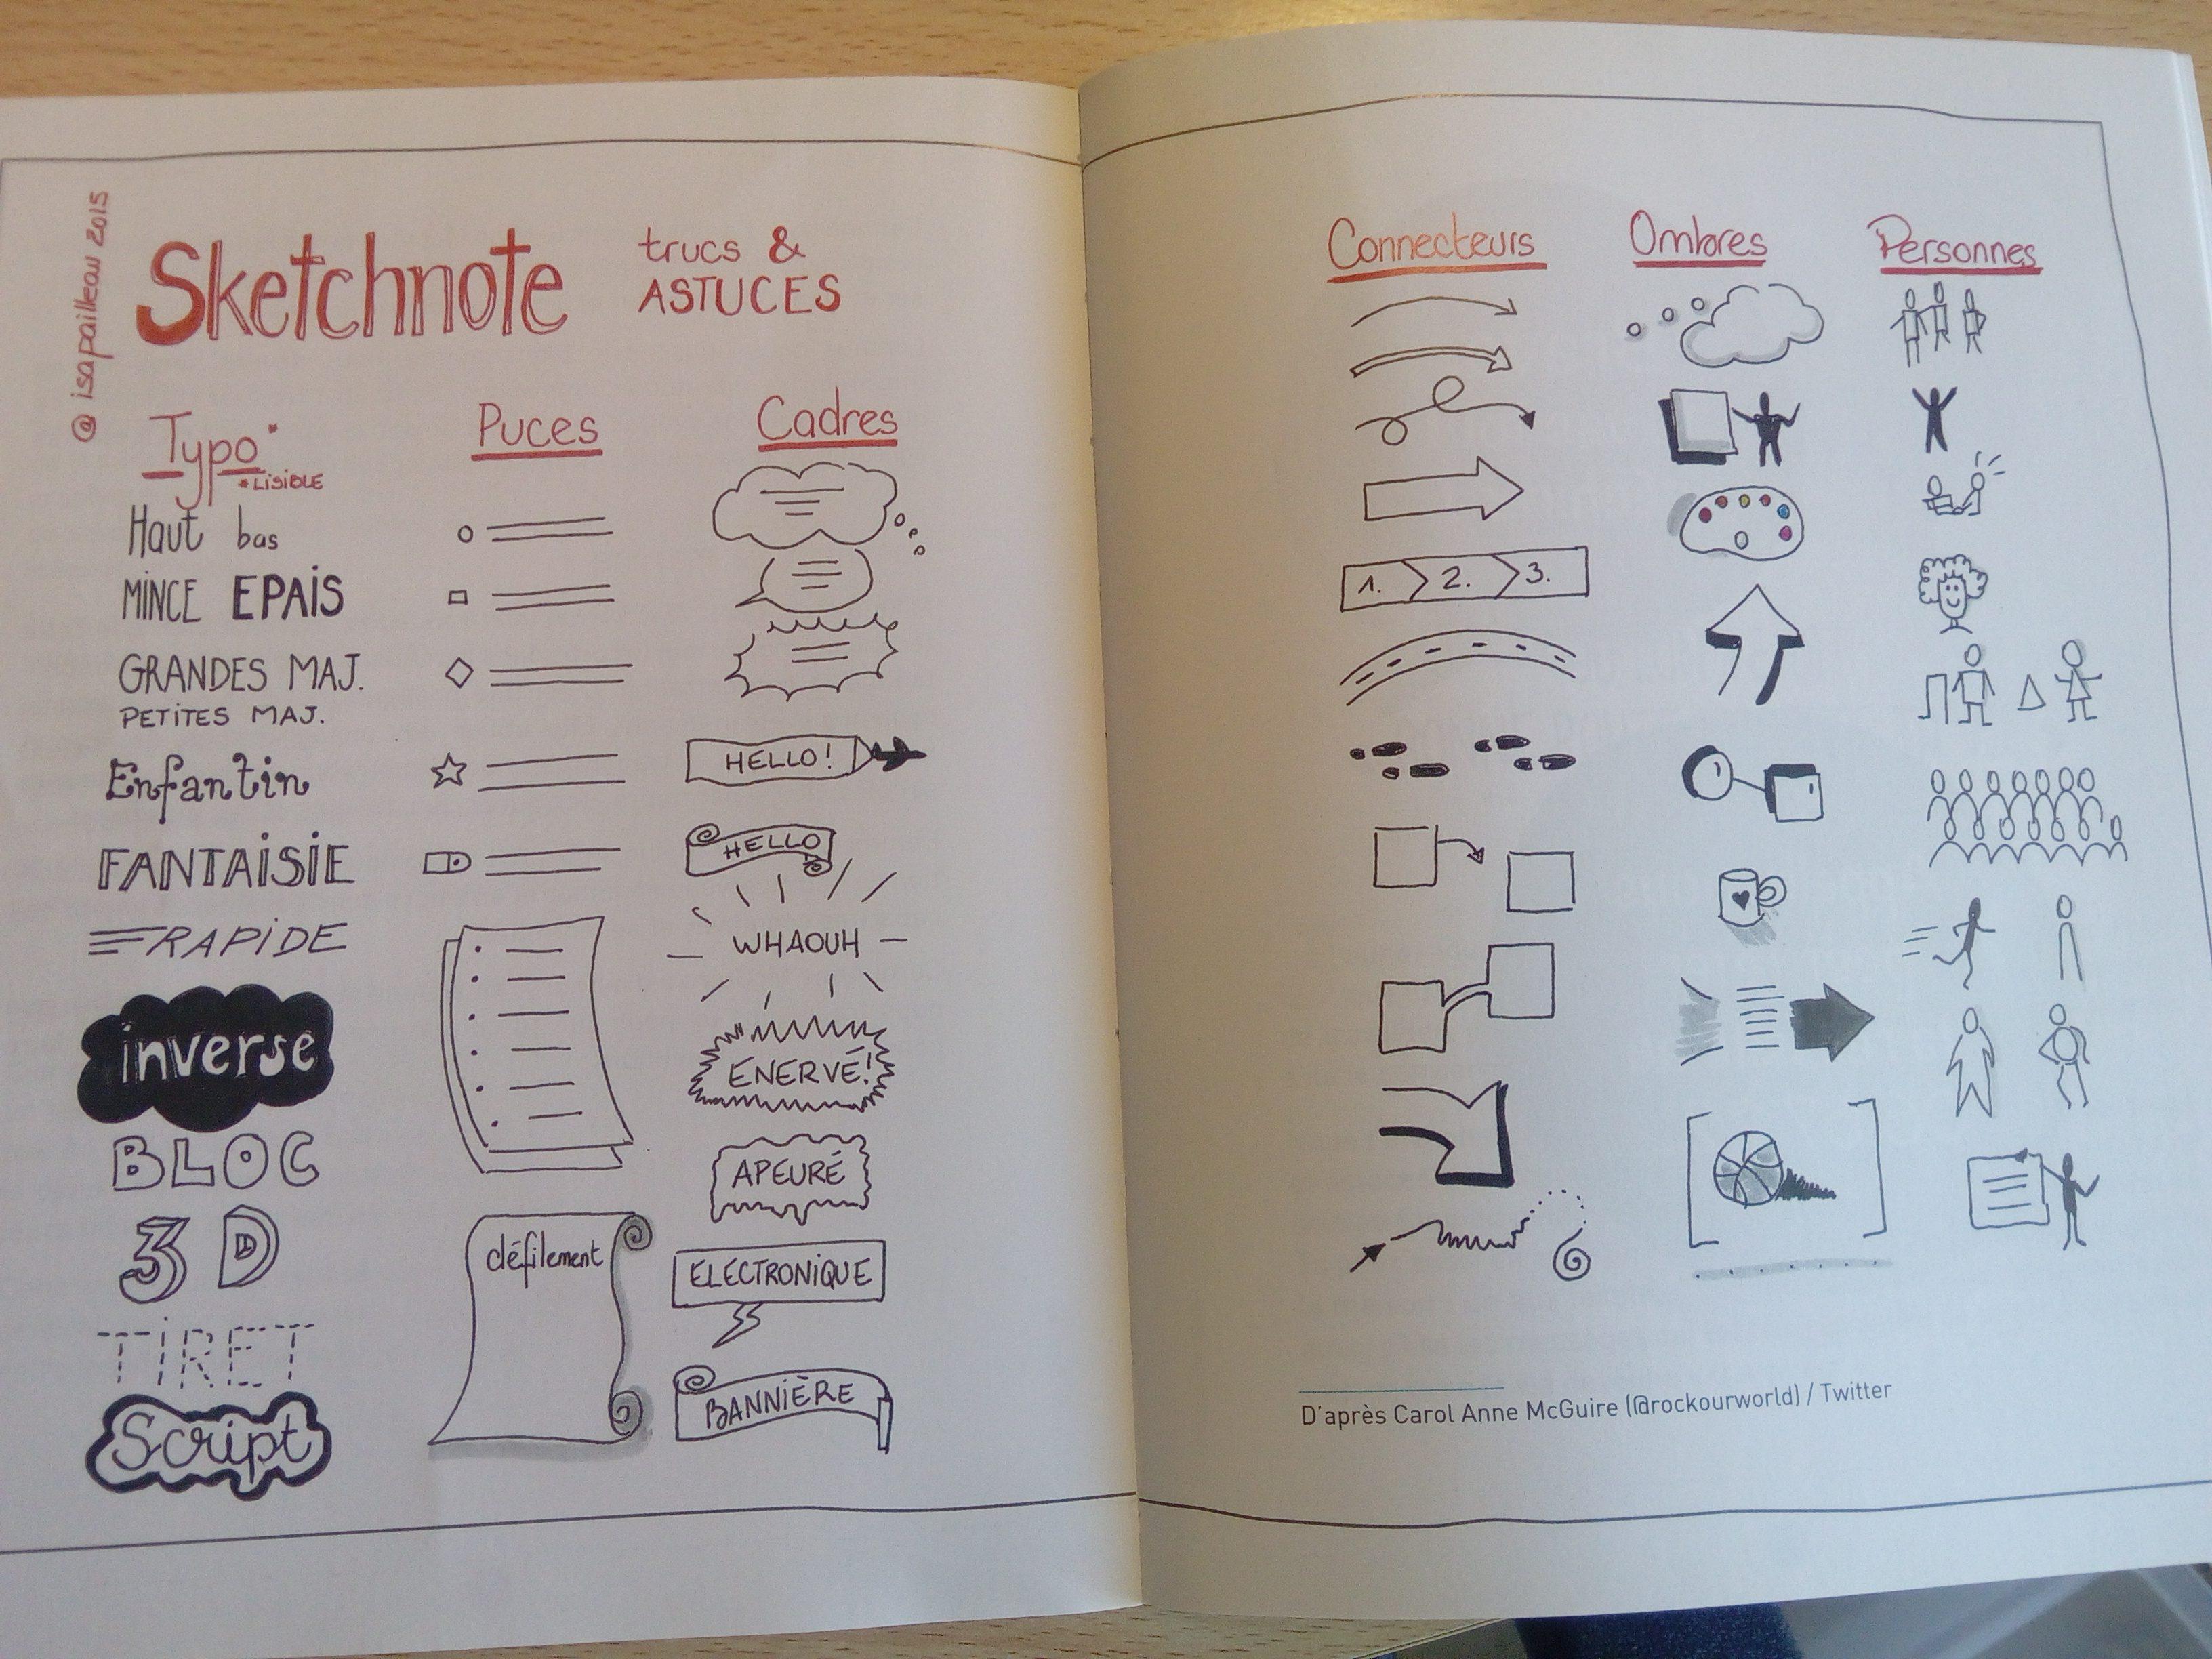 mode d'emploi sketchnote